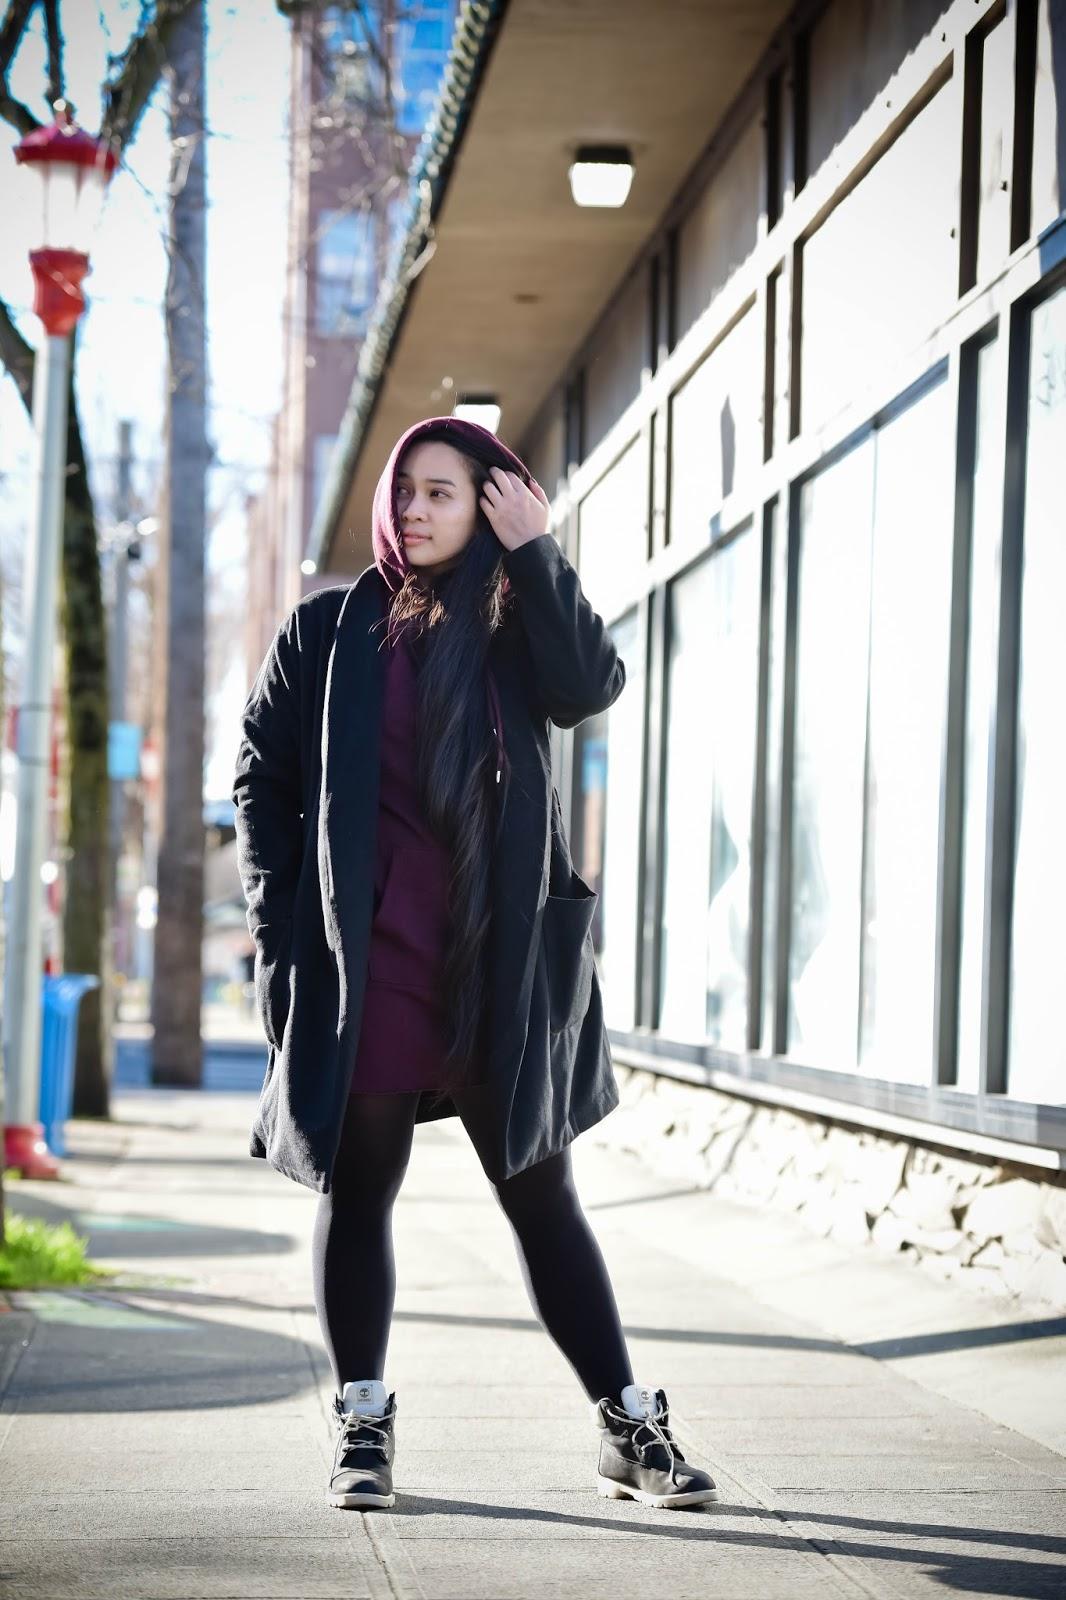 seattle blogger ootd international district chinatown h&m